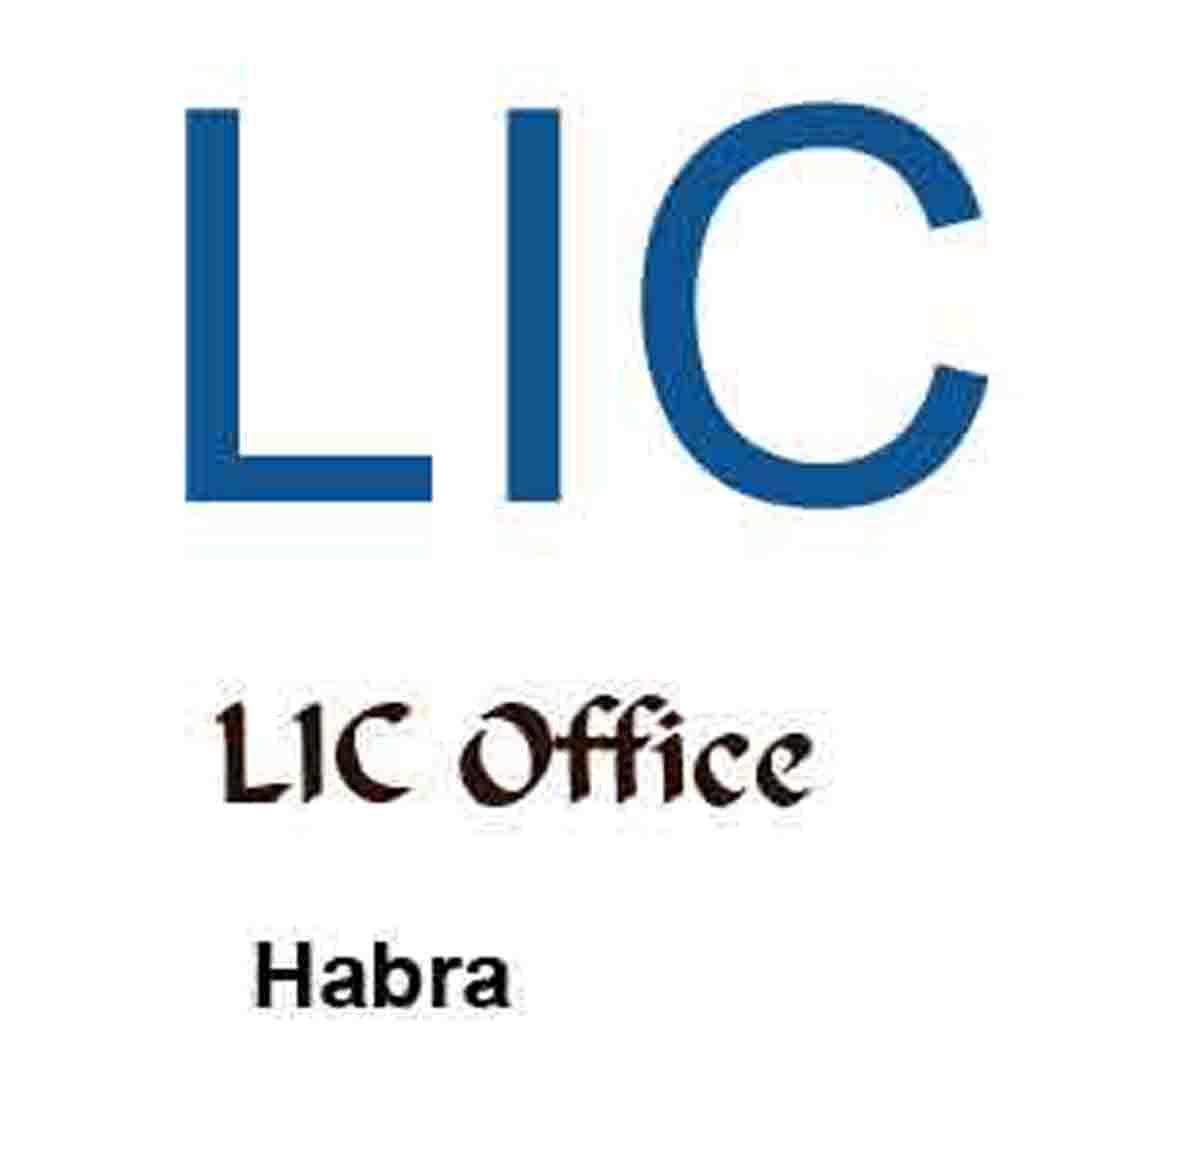 lic office habra